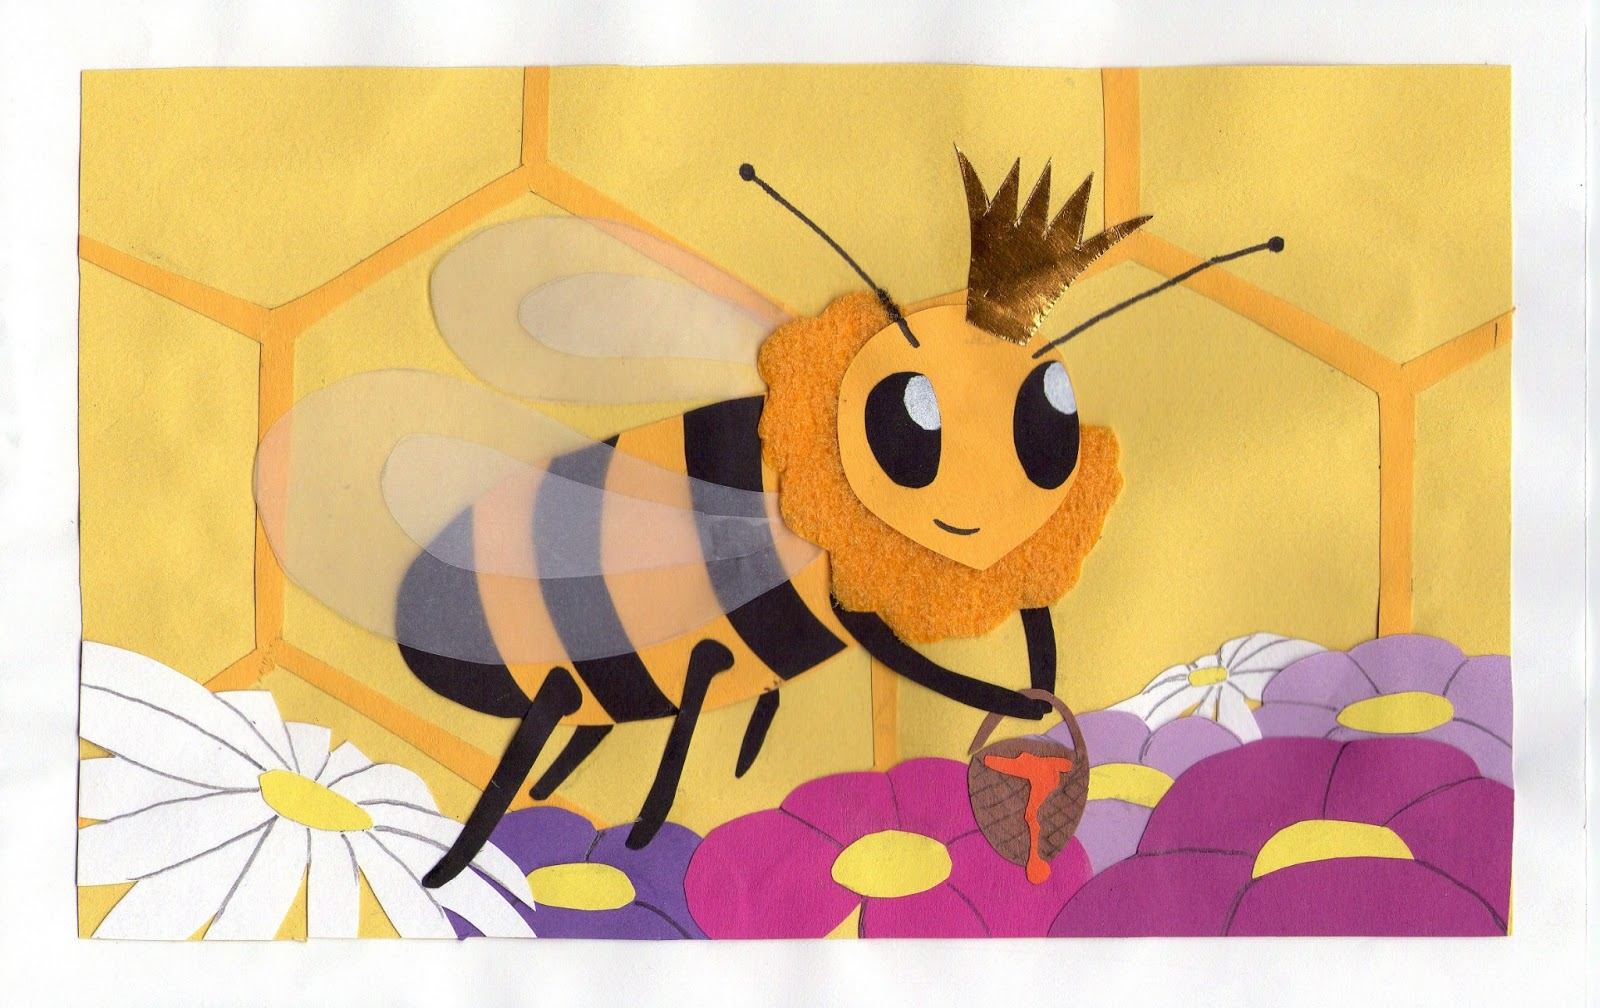 Tite ella apiculture ou maya l 39 abeille for Salon apiculture